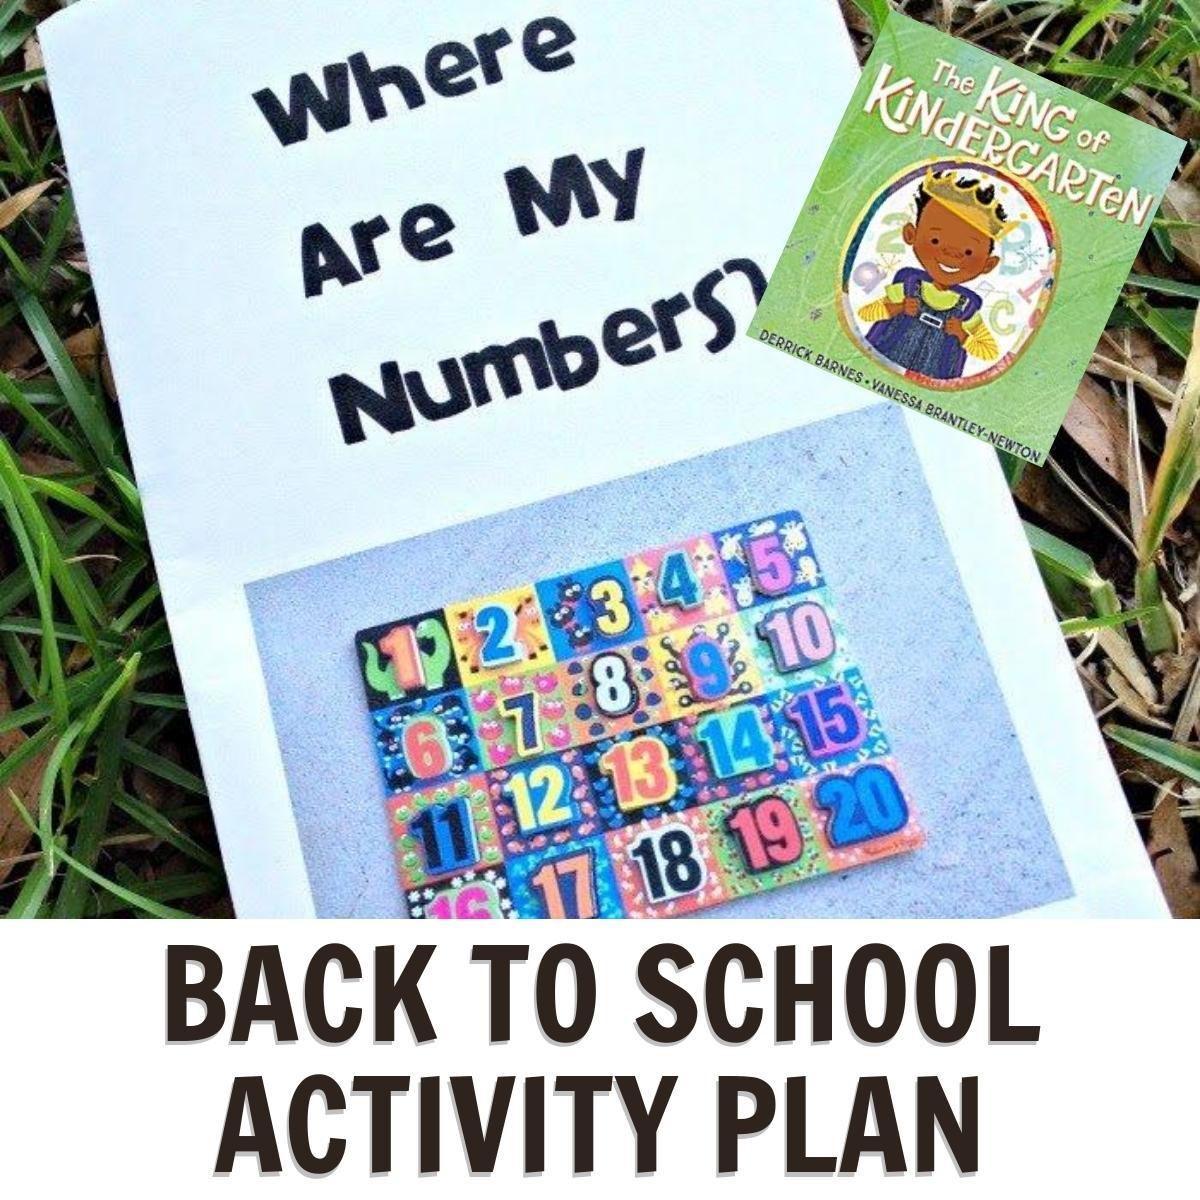 Back to School Week Activity Plan Featuring The King of Kindergarten